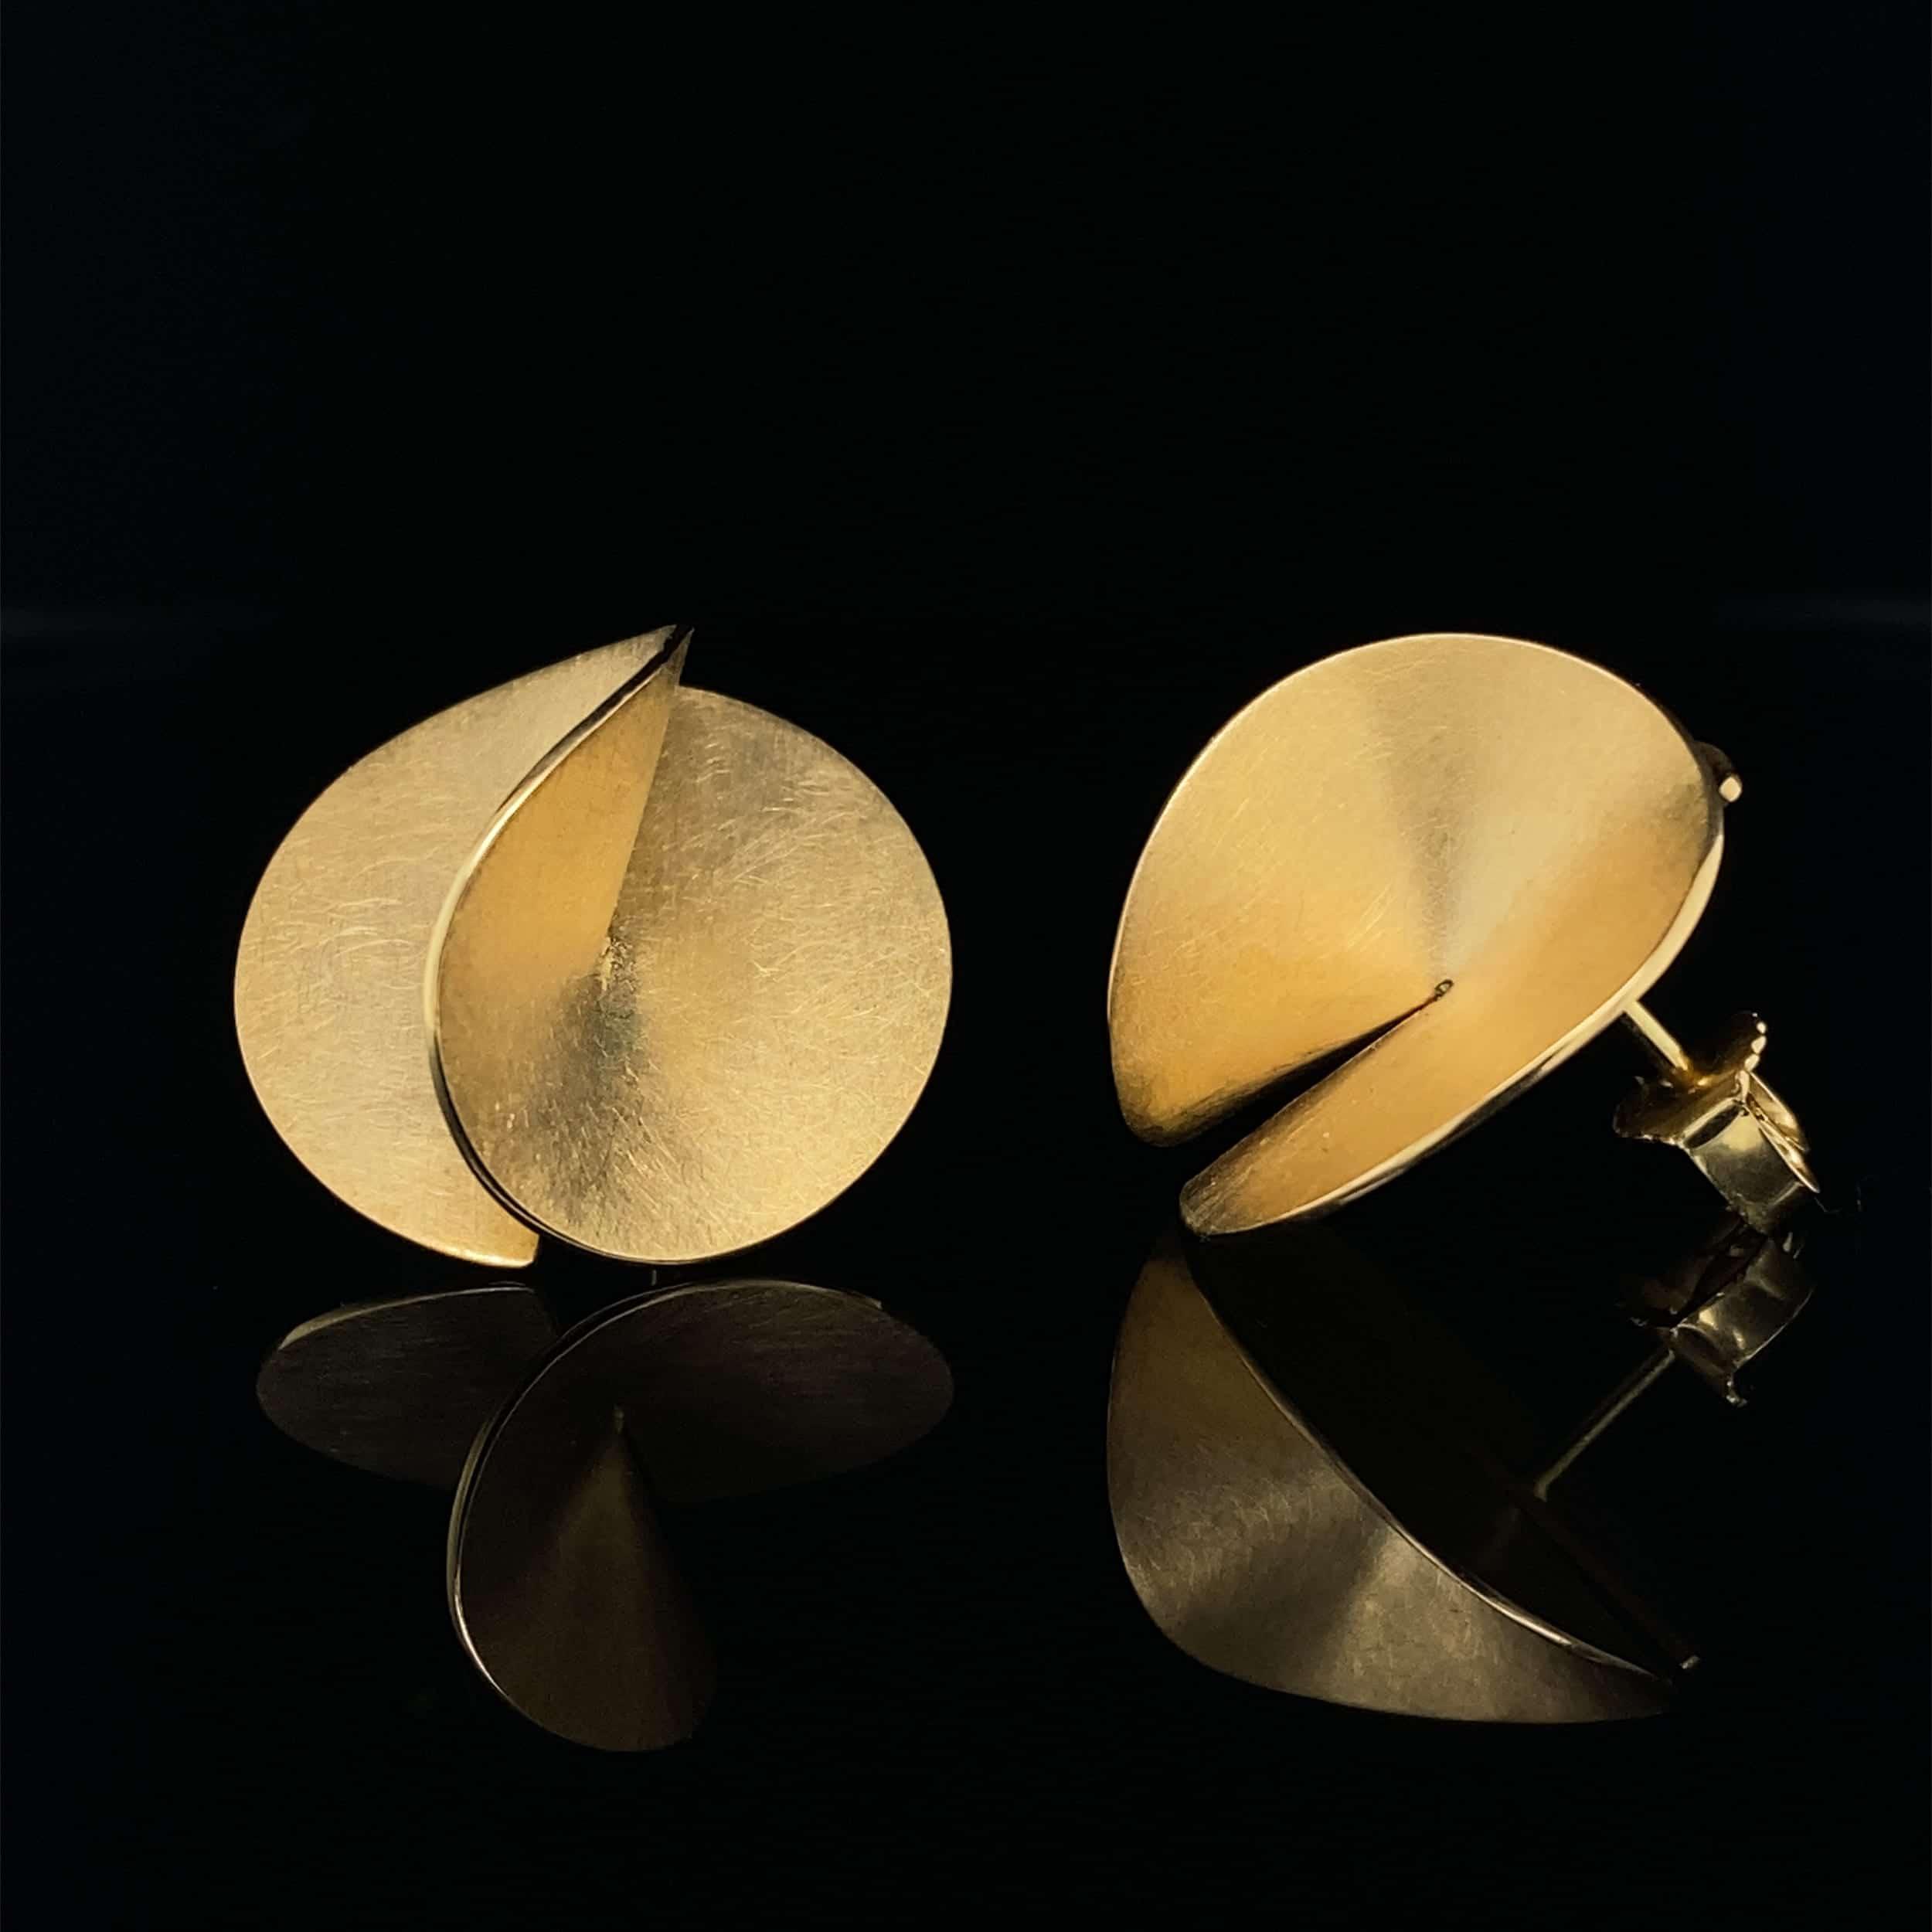 cardillac 18k yellow gold aster earrings designyard contemporary jewellery gallery dublin ireland